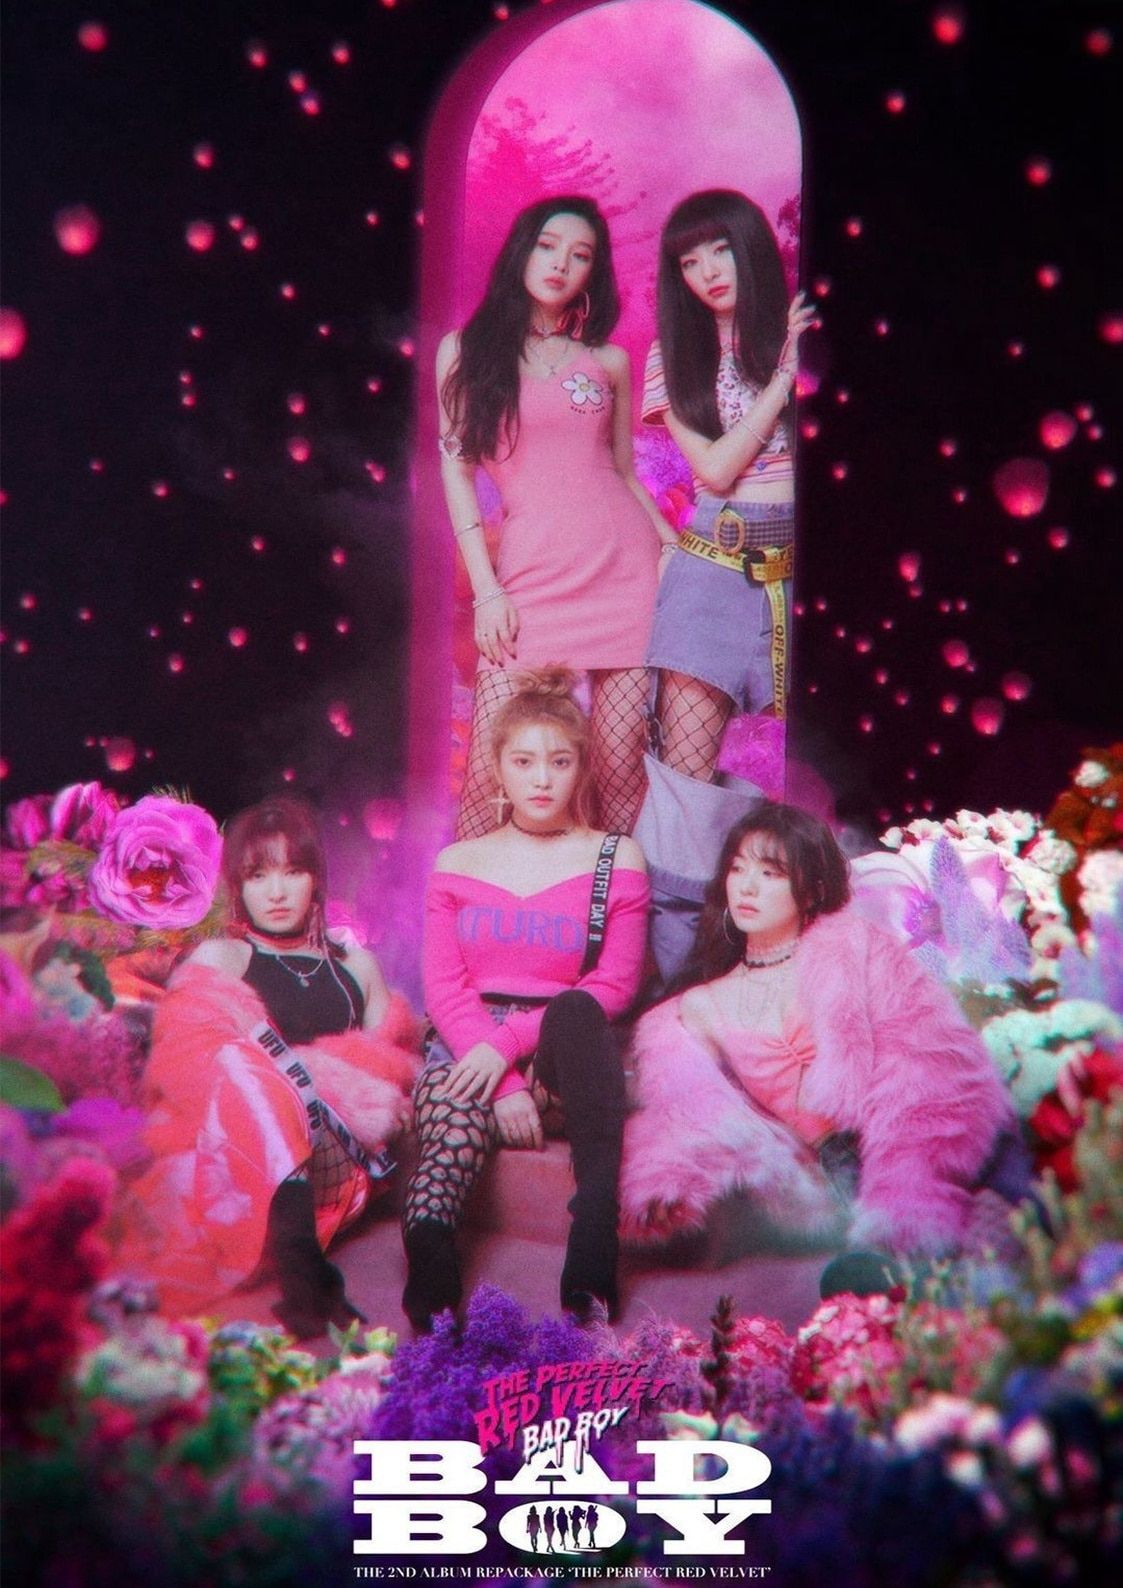 Red Velvet Bad Boy Wallpapers Top Free Red Velvet Bad Boy Backgrounds Wallpaperaccess